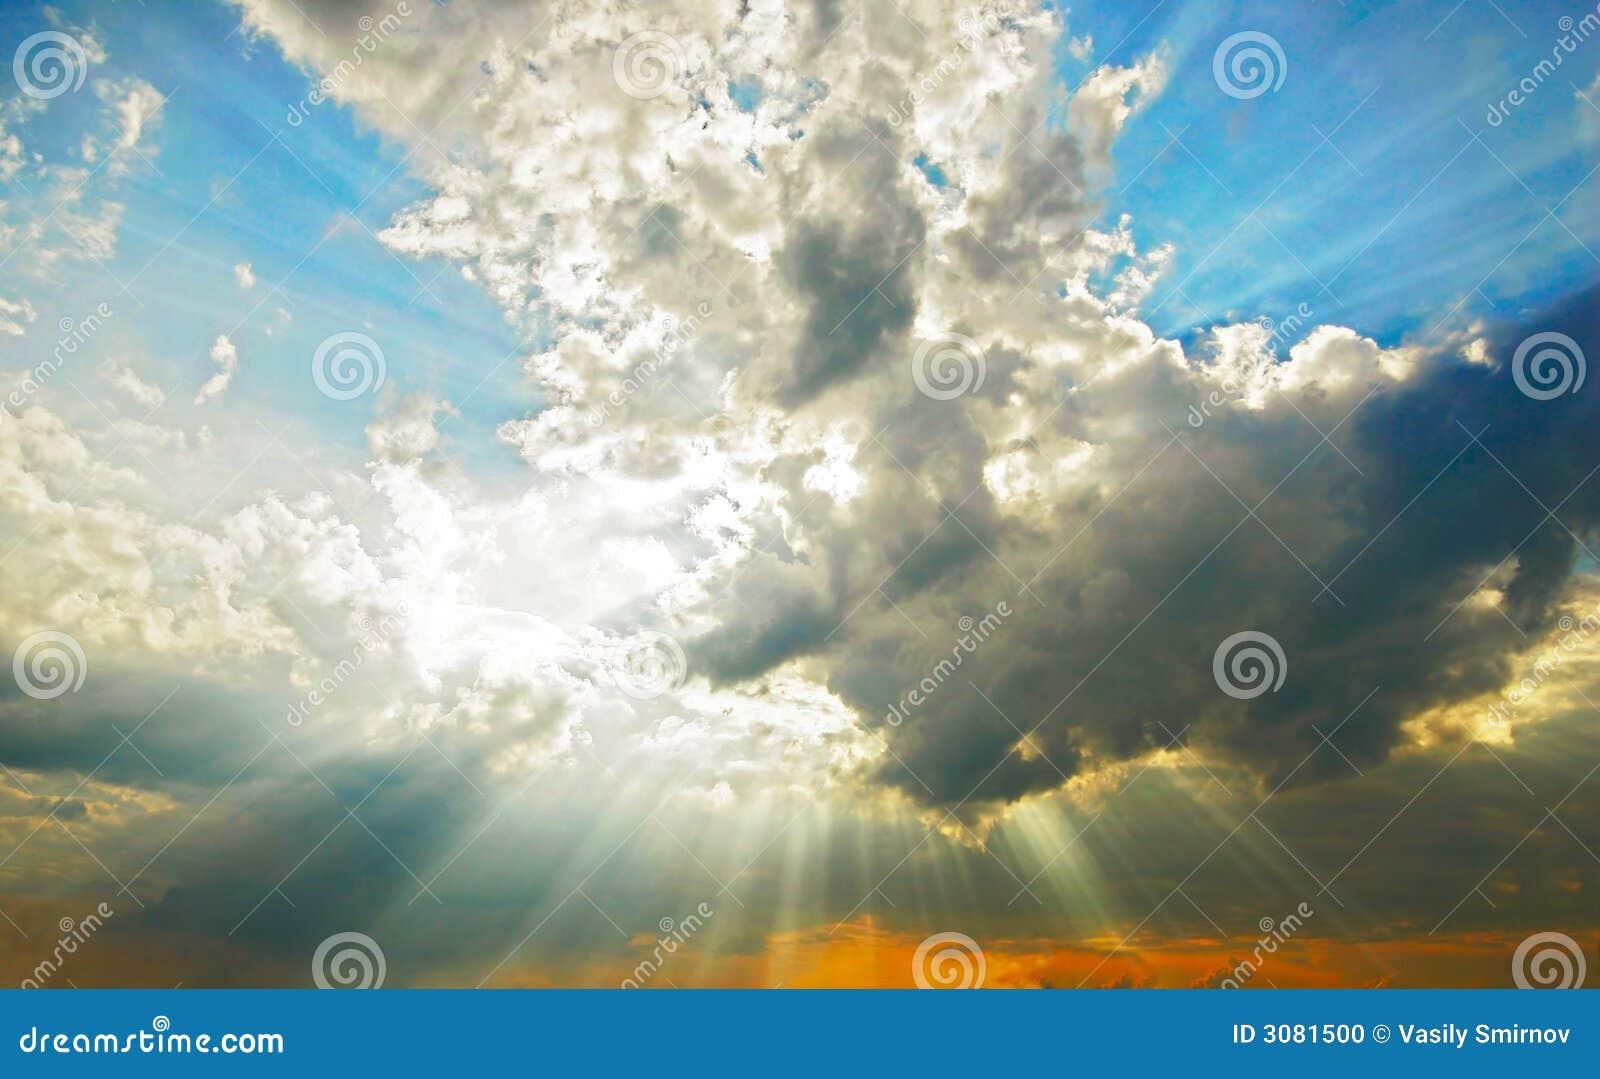 Beams through clouds